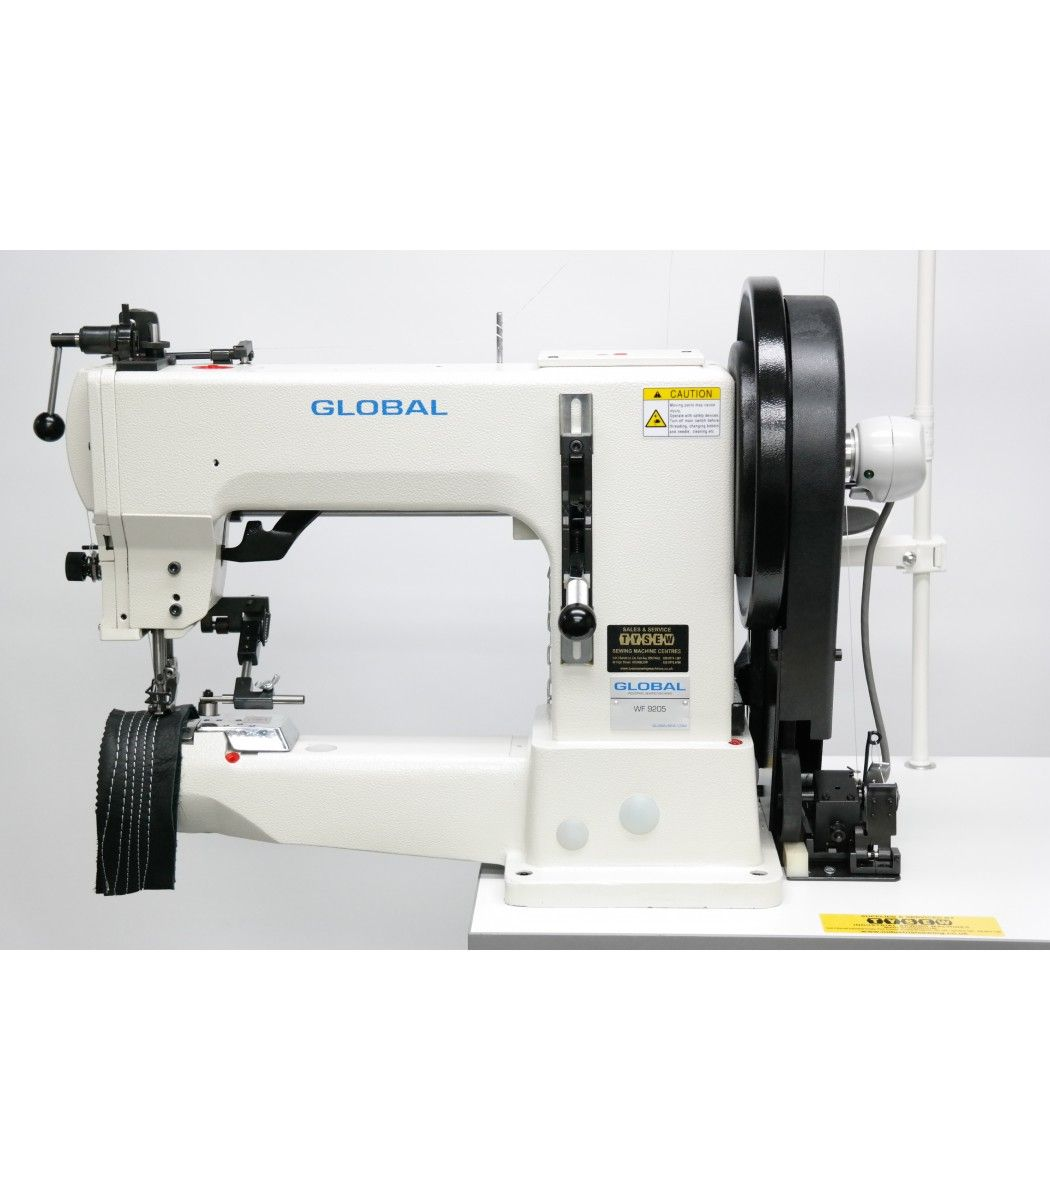 Global WF9205 Industrial Heavy Duty Cylinder Arm Walking Foot - IS-376 - Industrial Sewing Machines